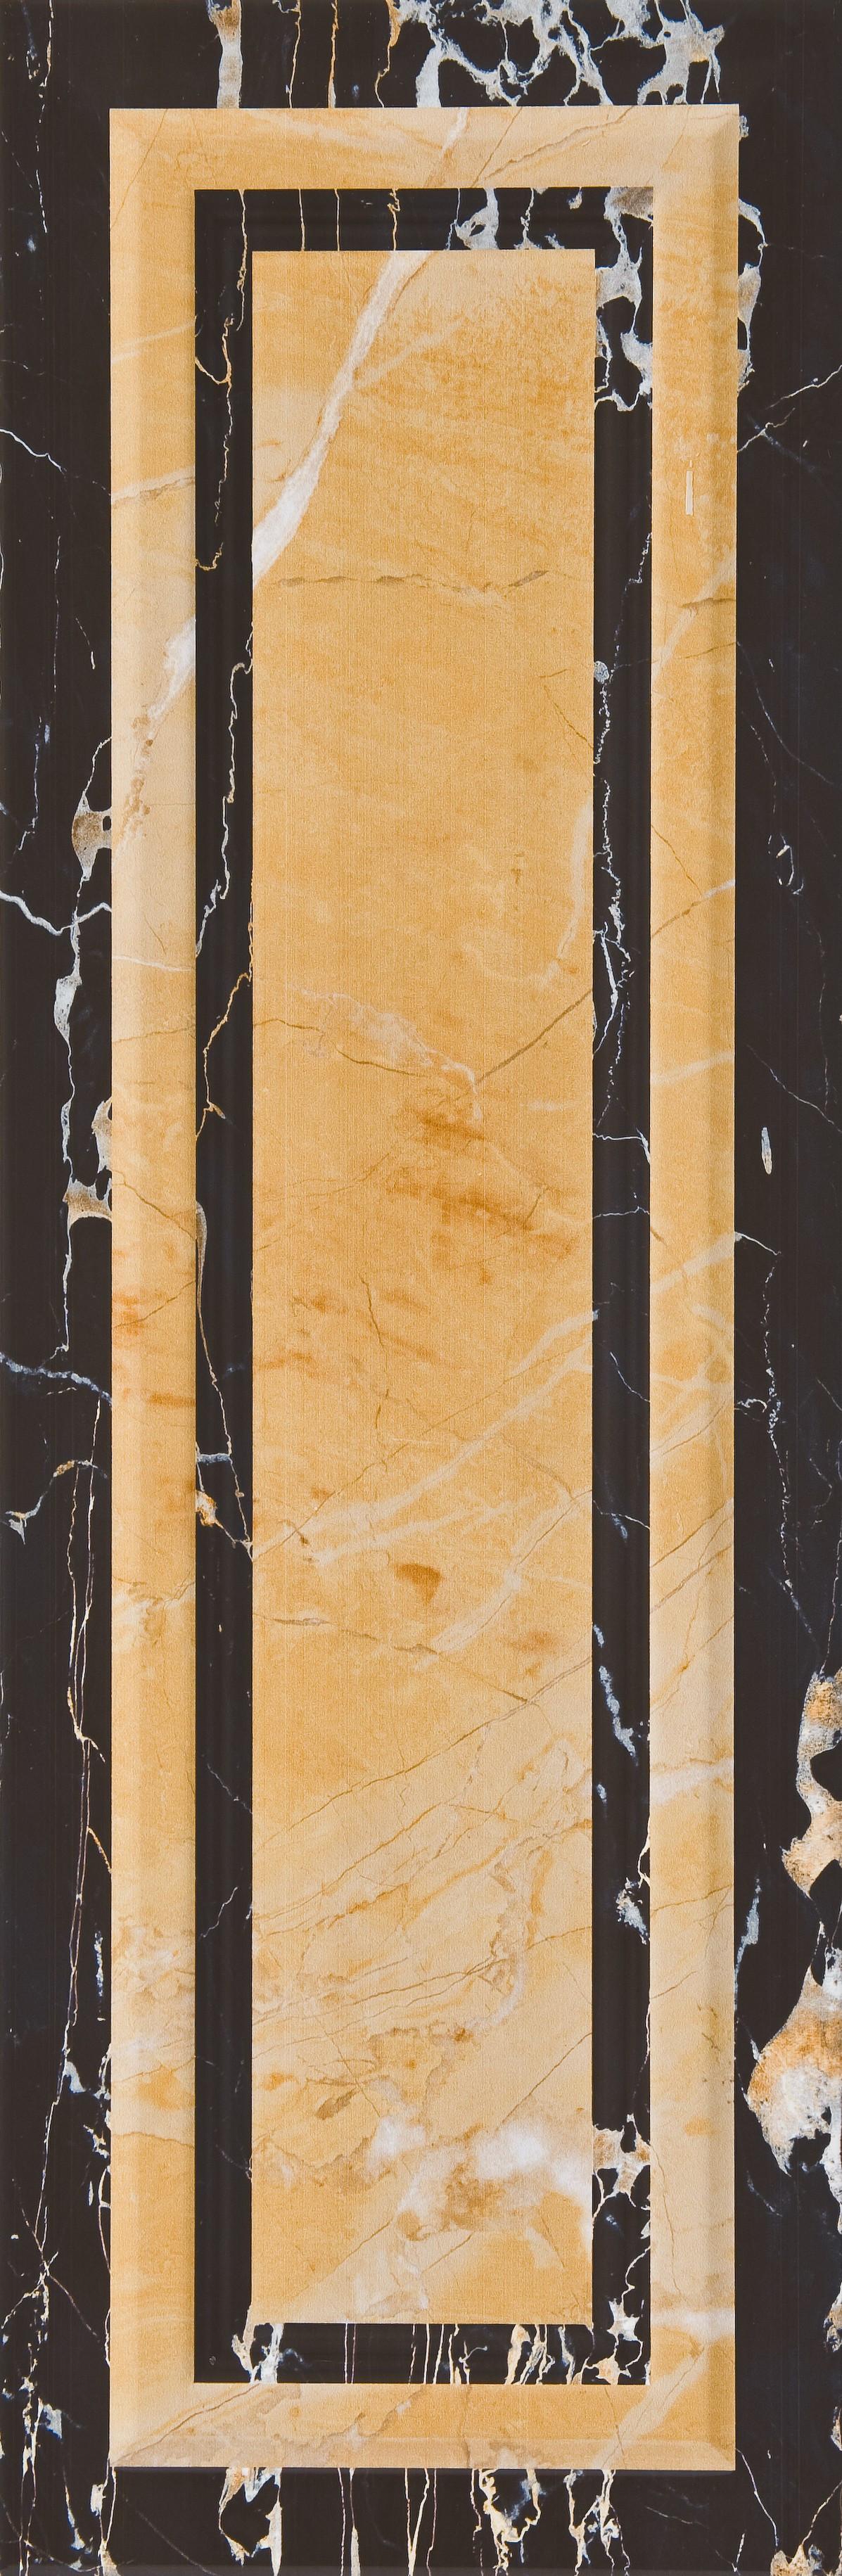 #Aparici #Luxury Portoro Negro Ornato 25,1x75,6 cm | #Porcelain stoneware #Marble #25,1x75,6 | on #bathroom39.com at 66 Euro/sqm | #tiles #ceramic #floor #bathroom #kitchen #outdoor